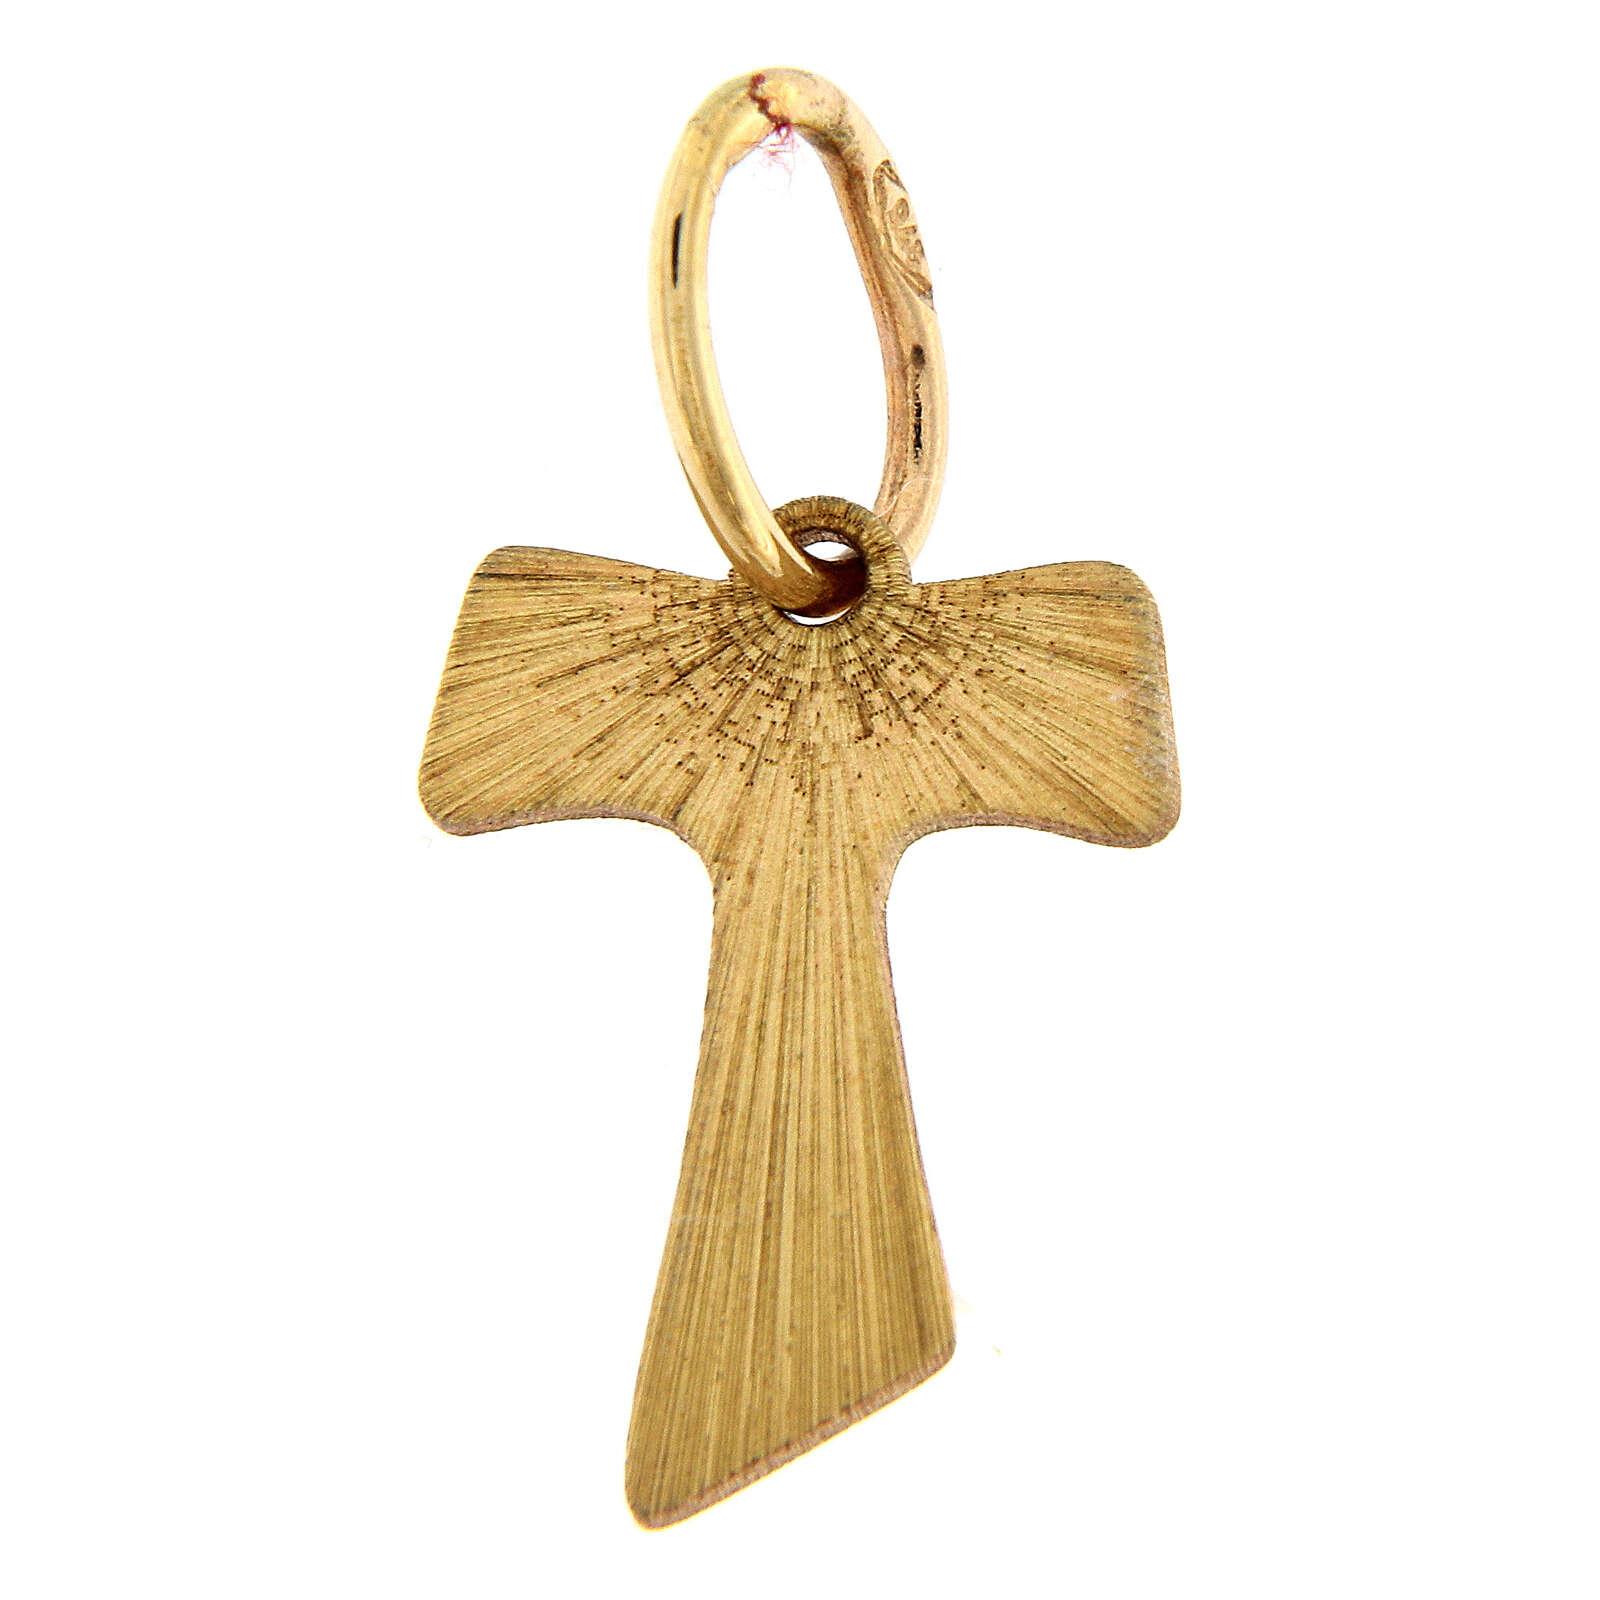 Croix pendentif Tau or 18K effet bois 0,2 gr 4